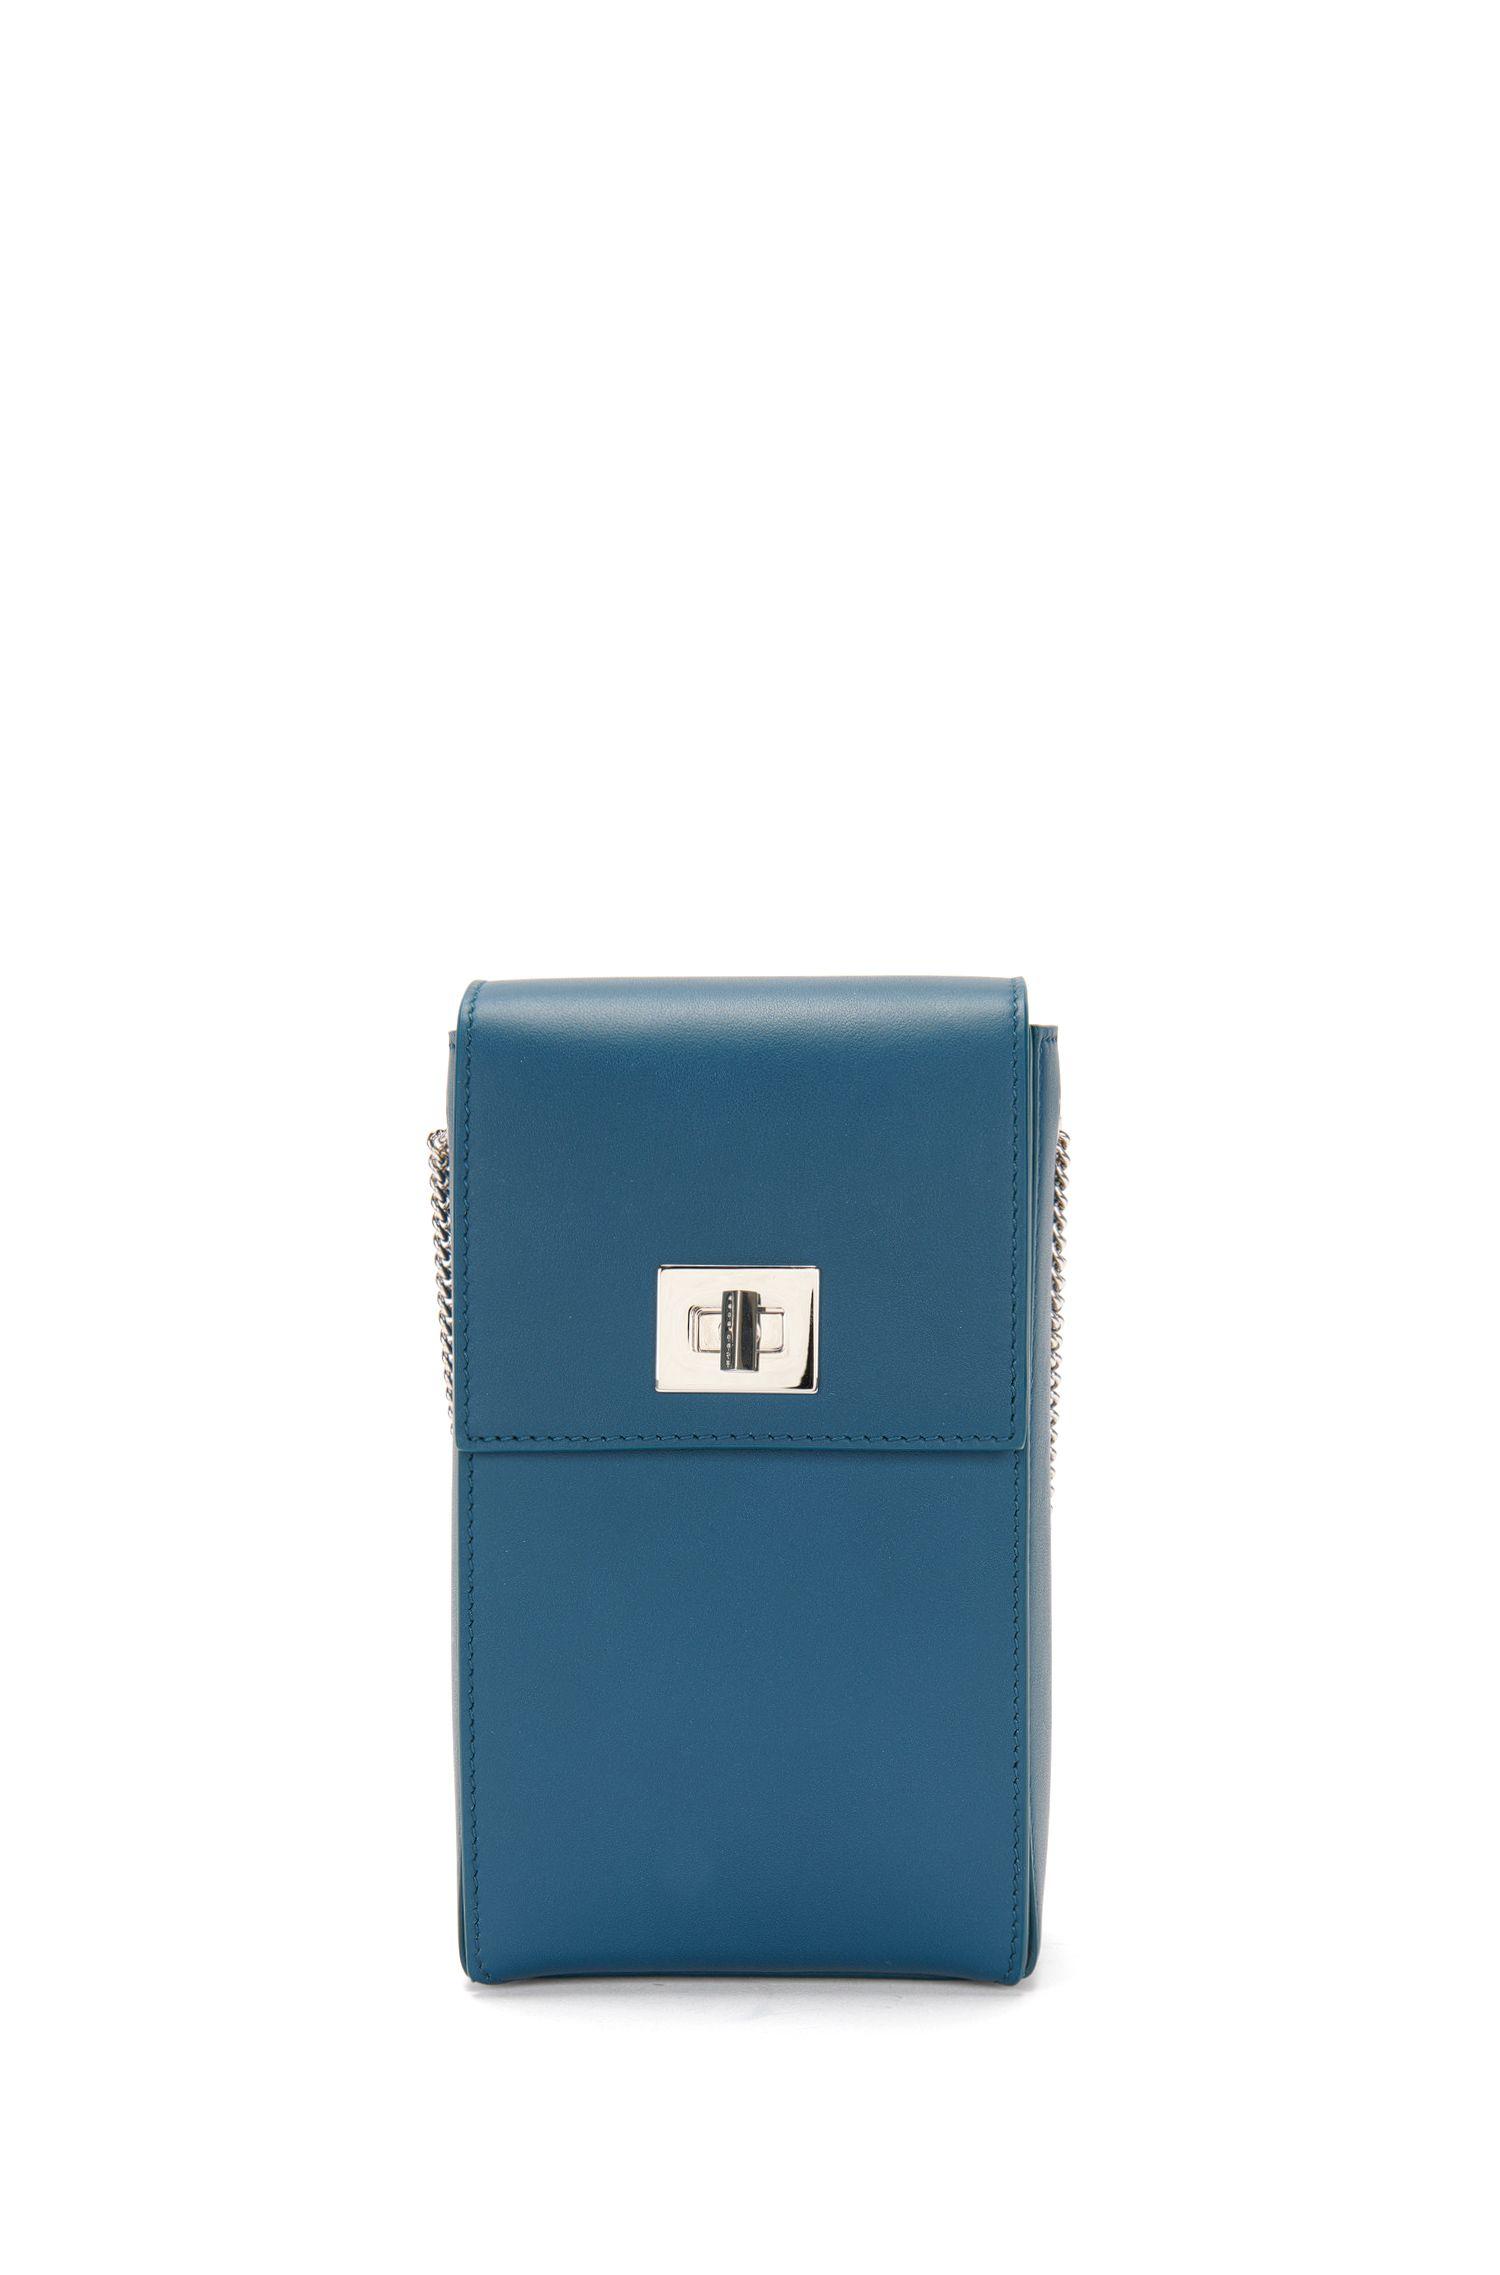 'BOSS Bespoke XXS N' | Italian Miniature Handbag, Detachable Shoulder Strap